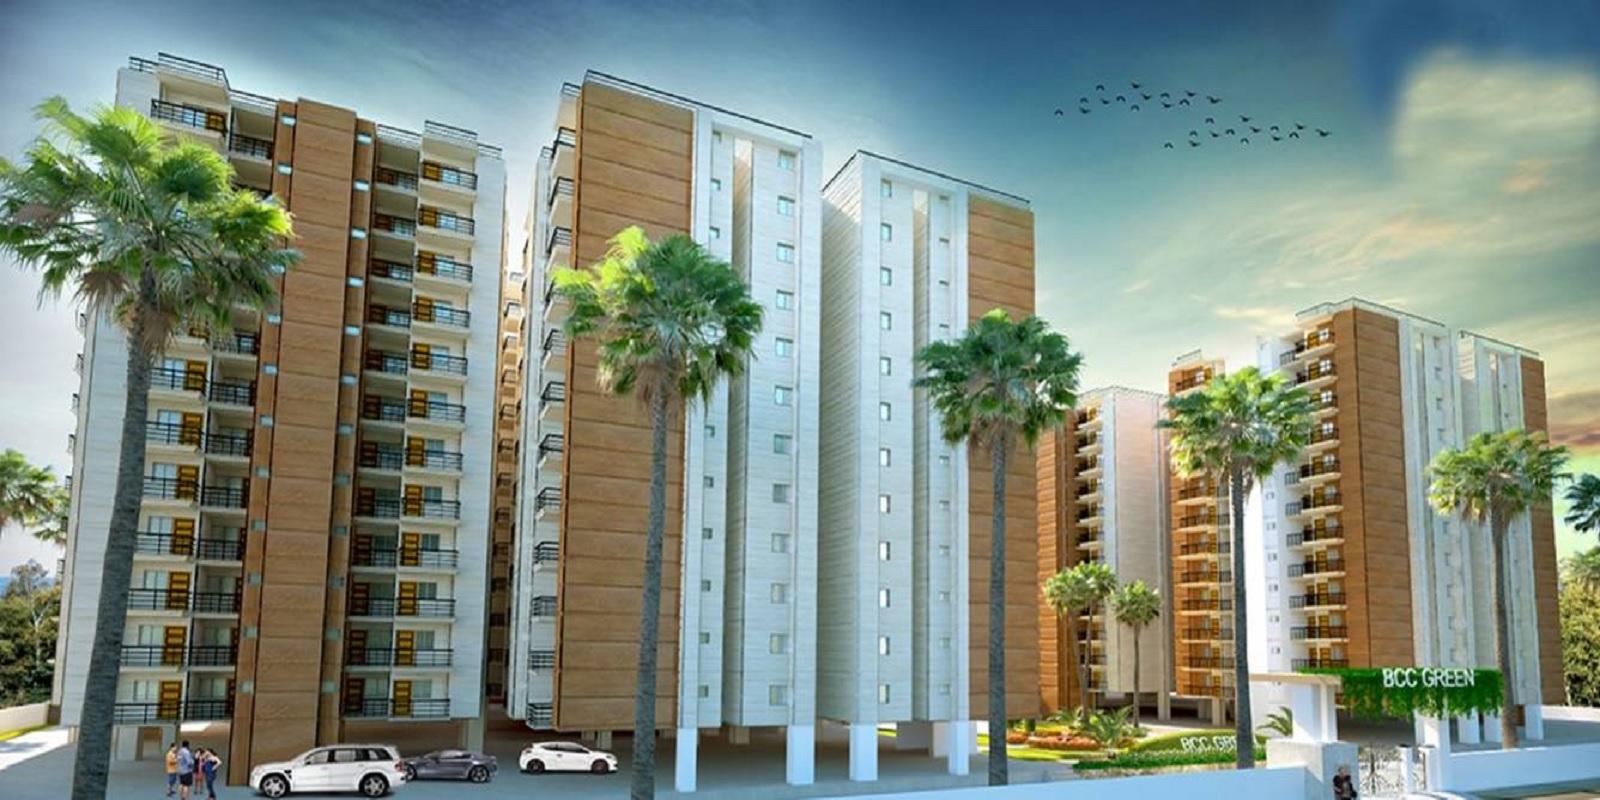 shri balaji construction bcc greens project project large image1